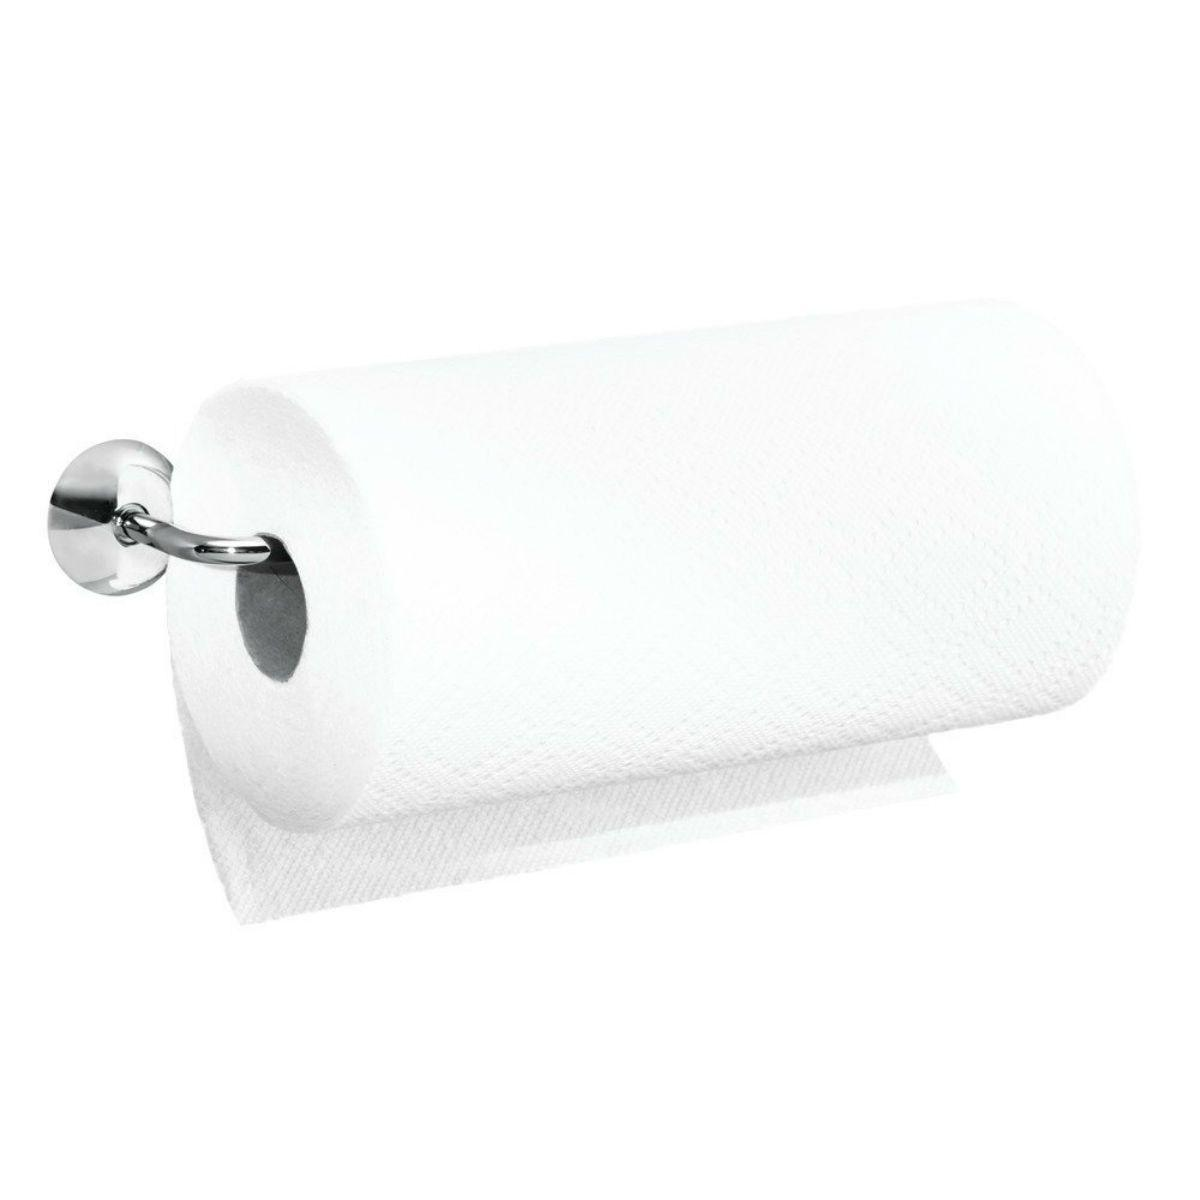 Kitchen Towel Holder Mount Under Cabinet Rod Horizontal